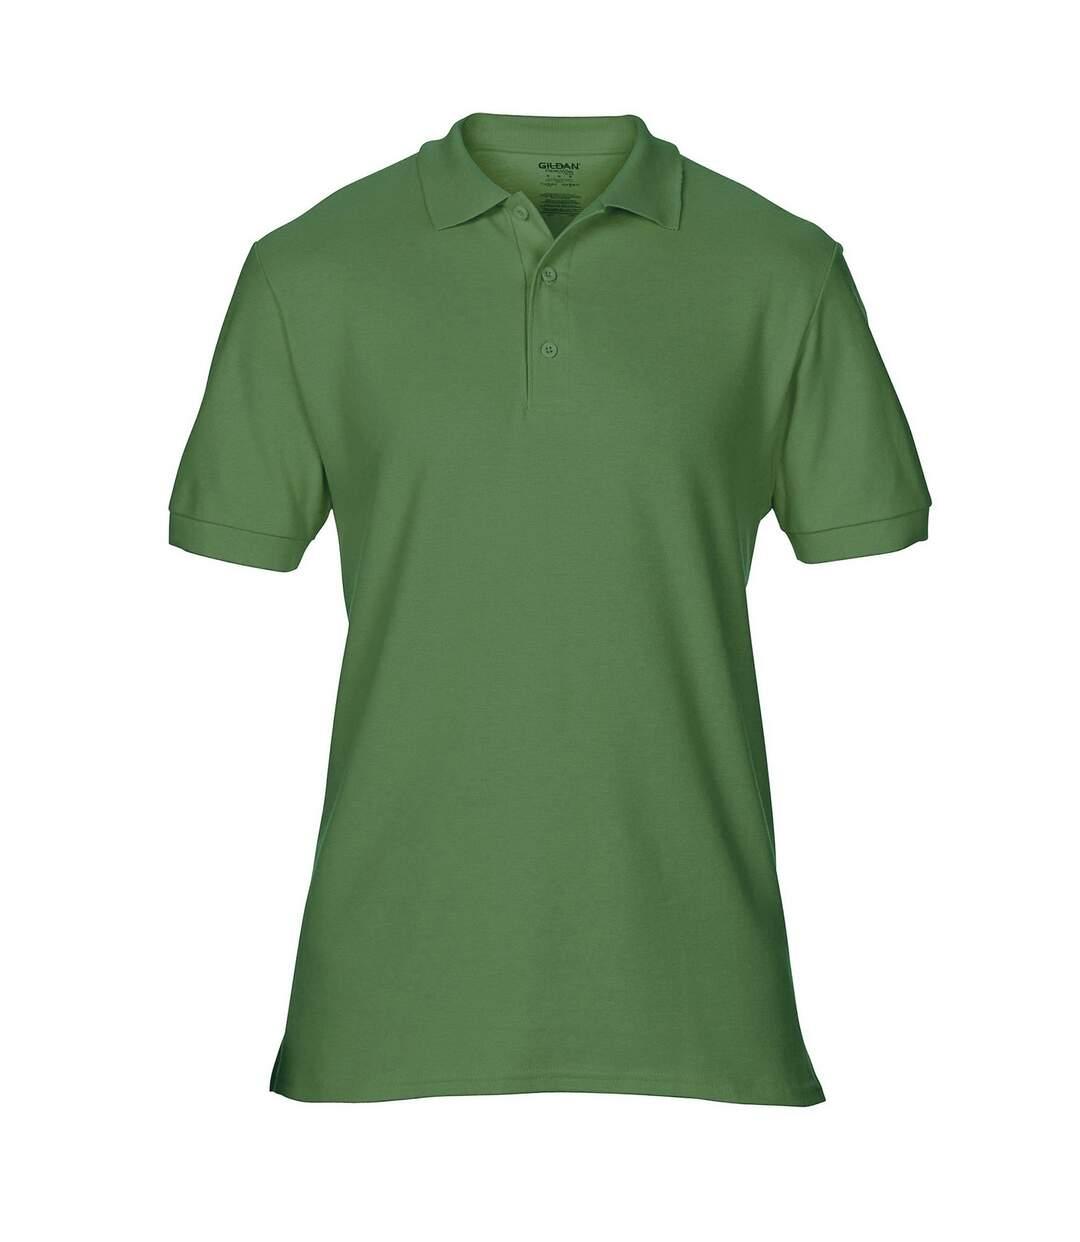 Gildan Mens Premium Cotton Sport Double Pique Polo Shirt (Graphite Heather) - UTBC3194